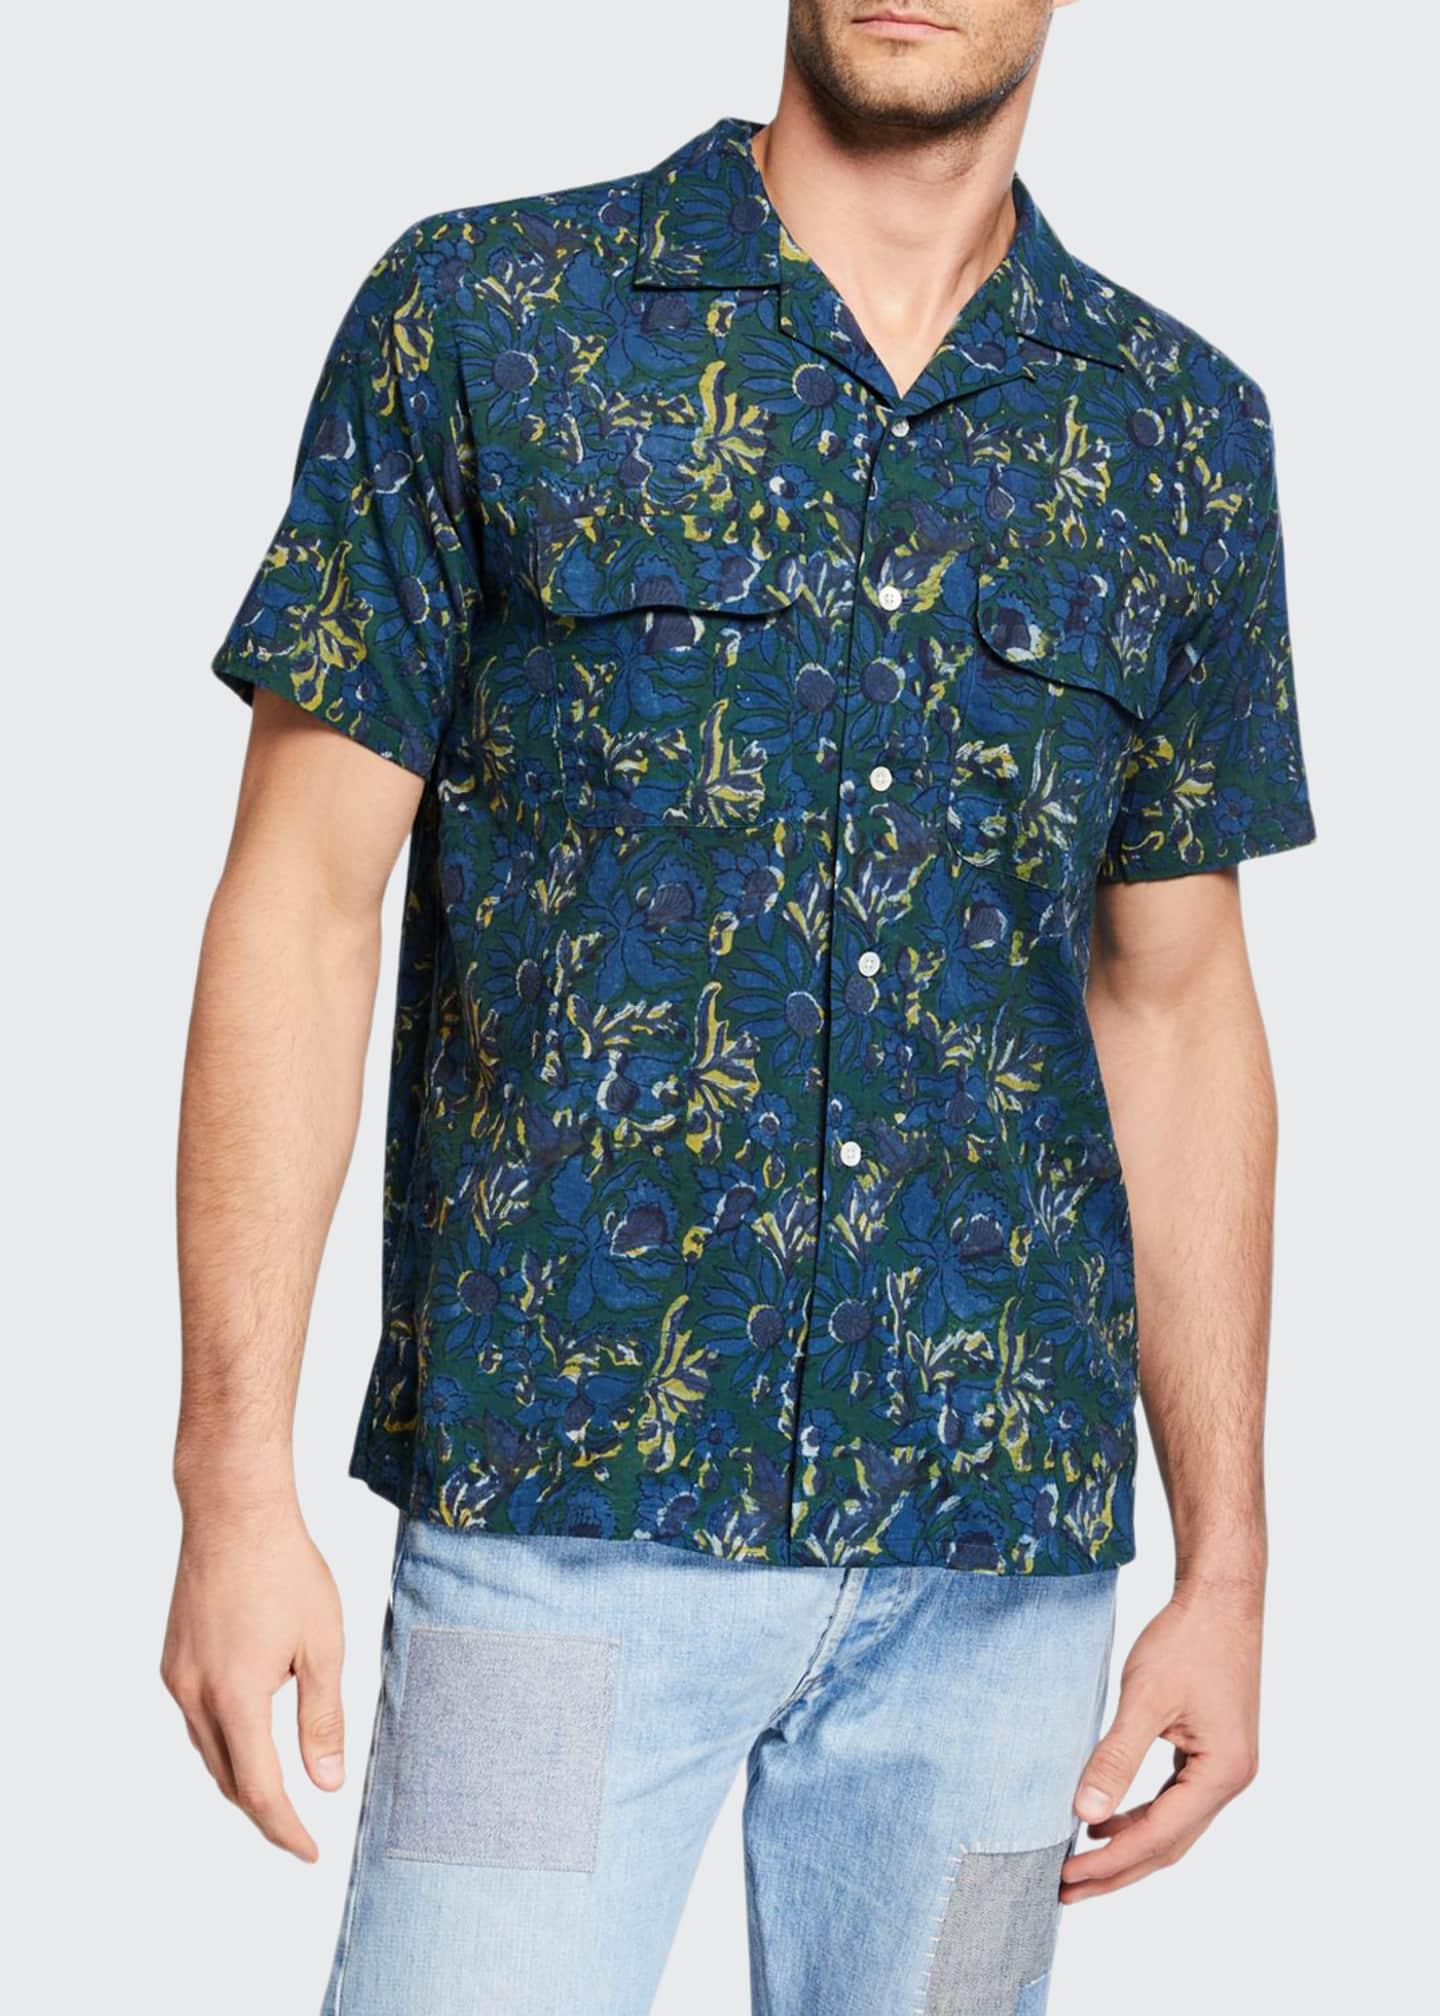 Beams Plus Men's Madras Woven Sport Shirt